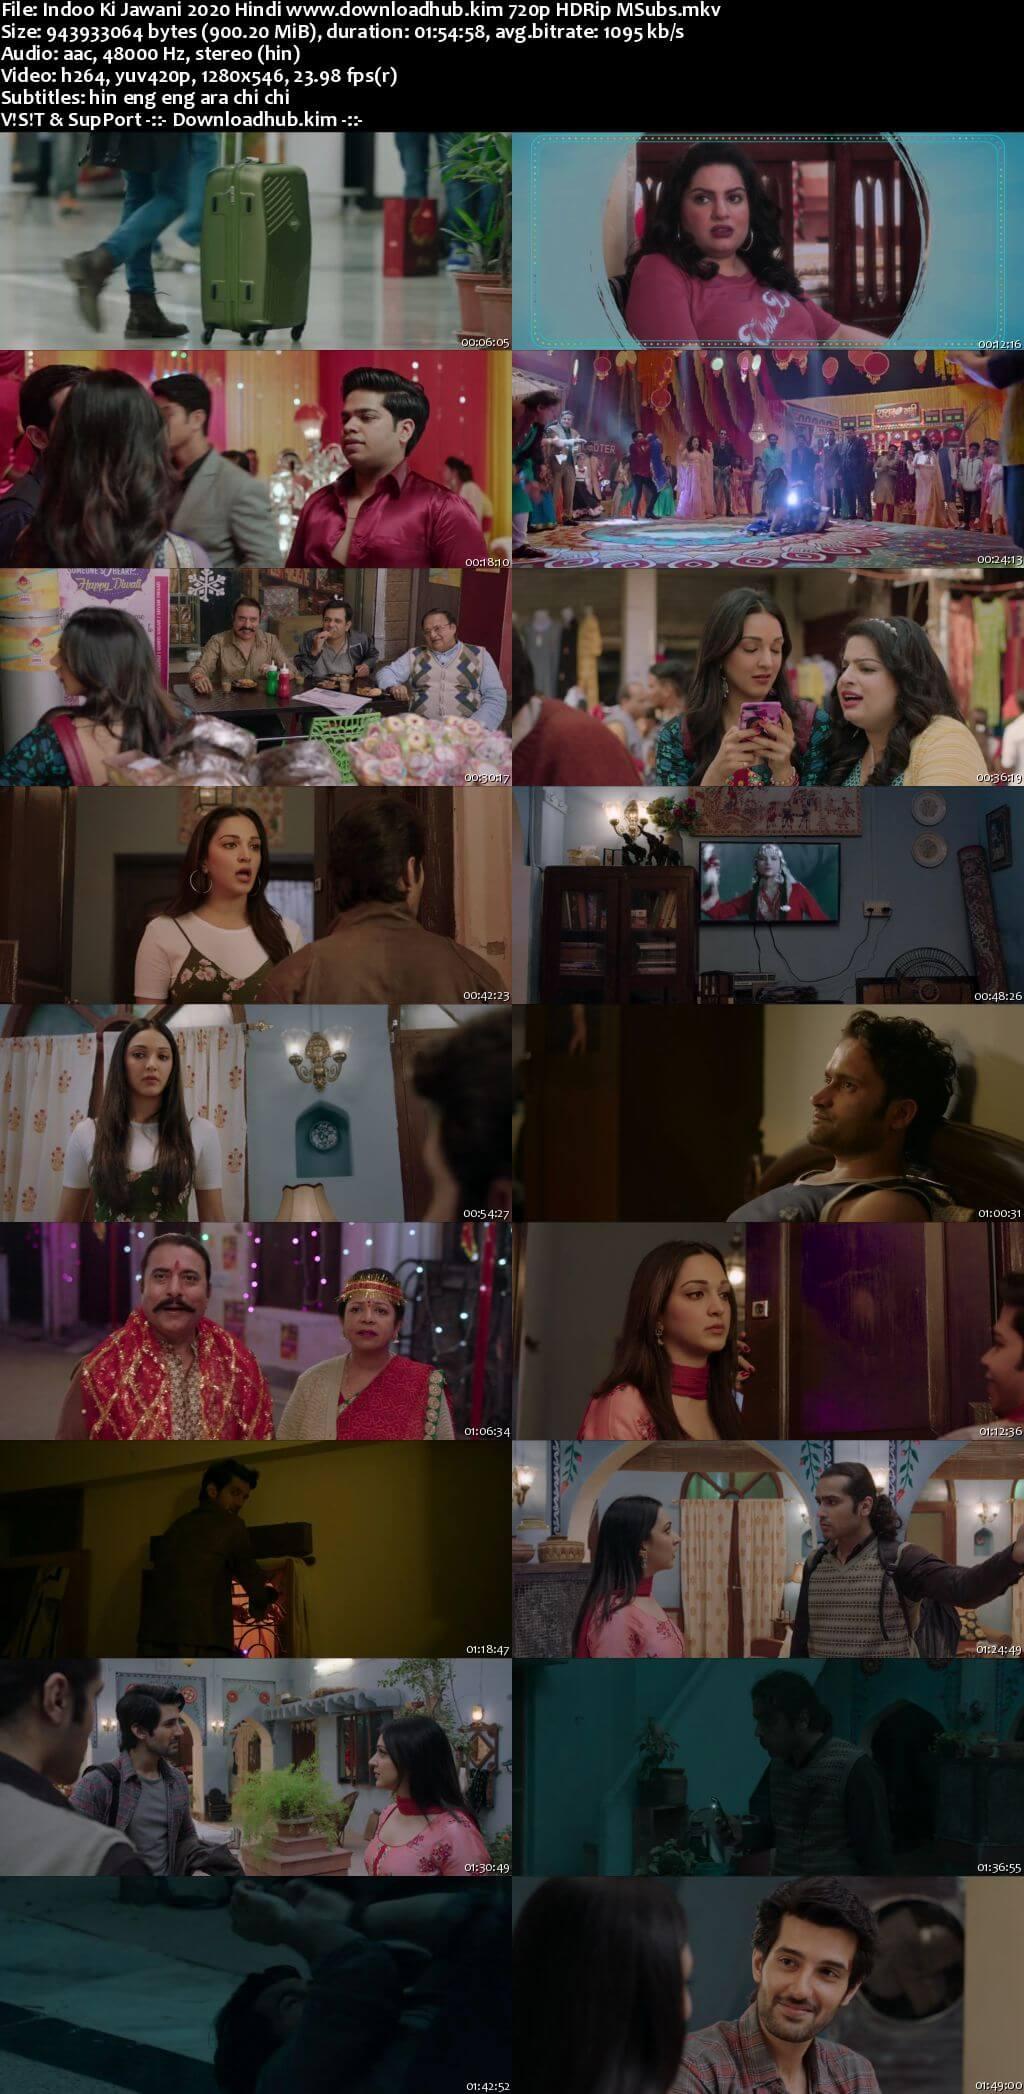 Indoo Ki Jawani 2020 Hindi 720p HDRip MSubs